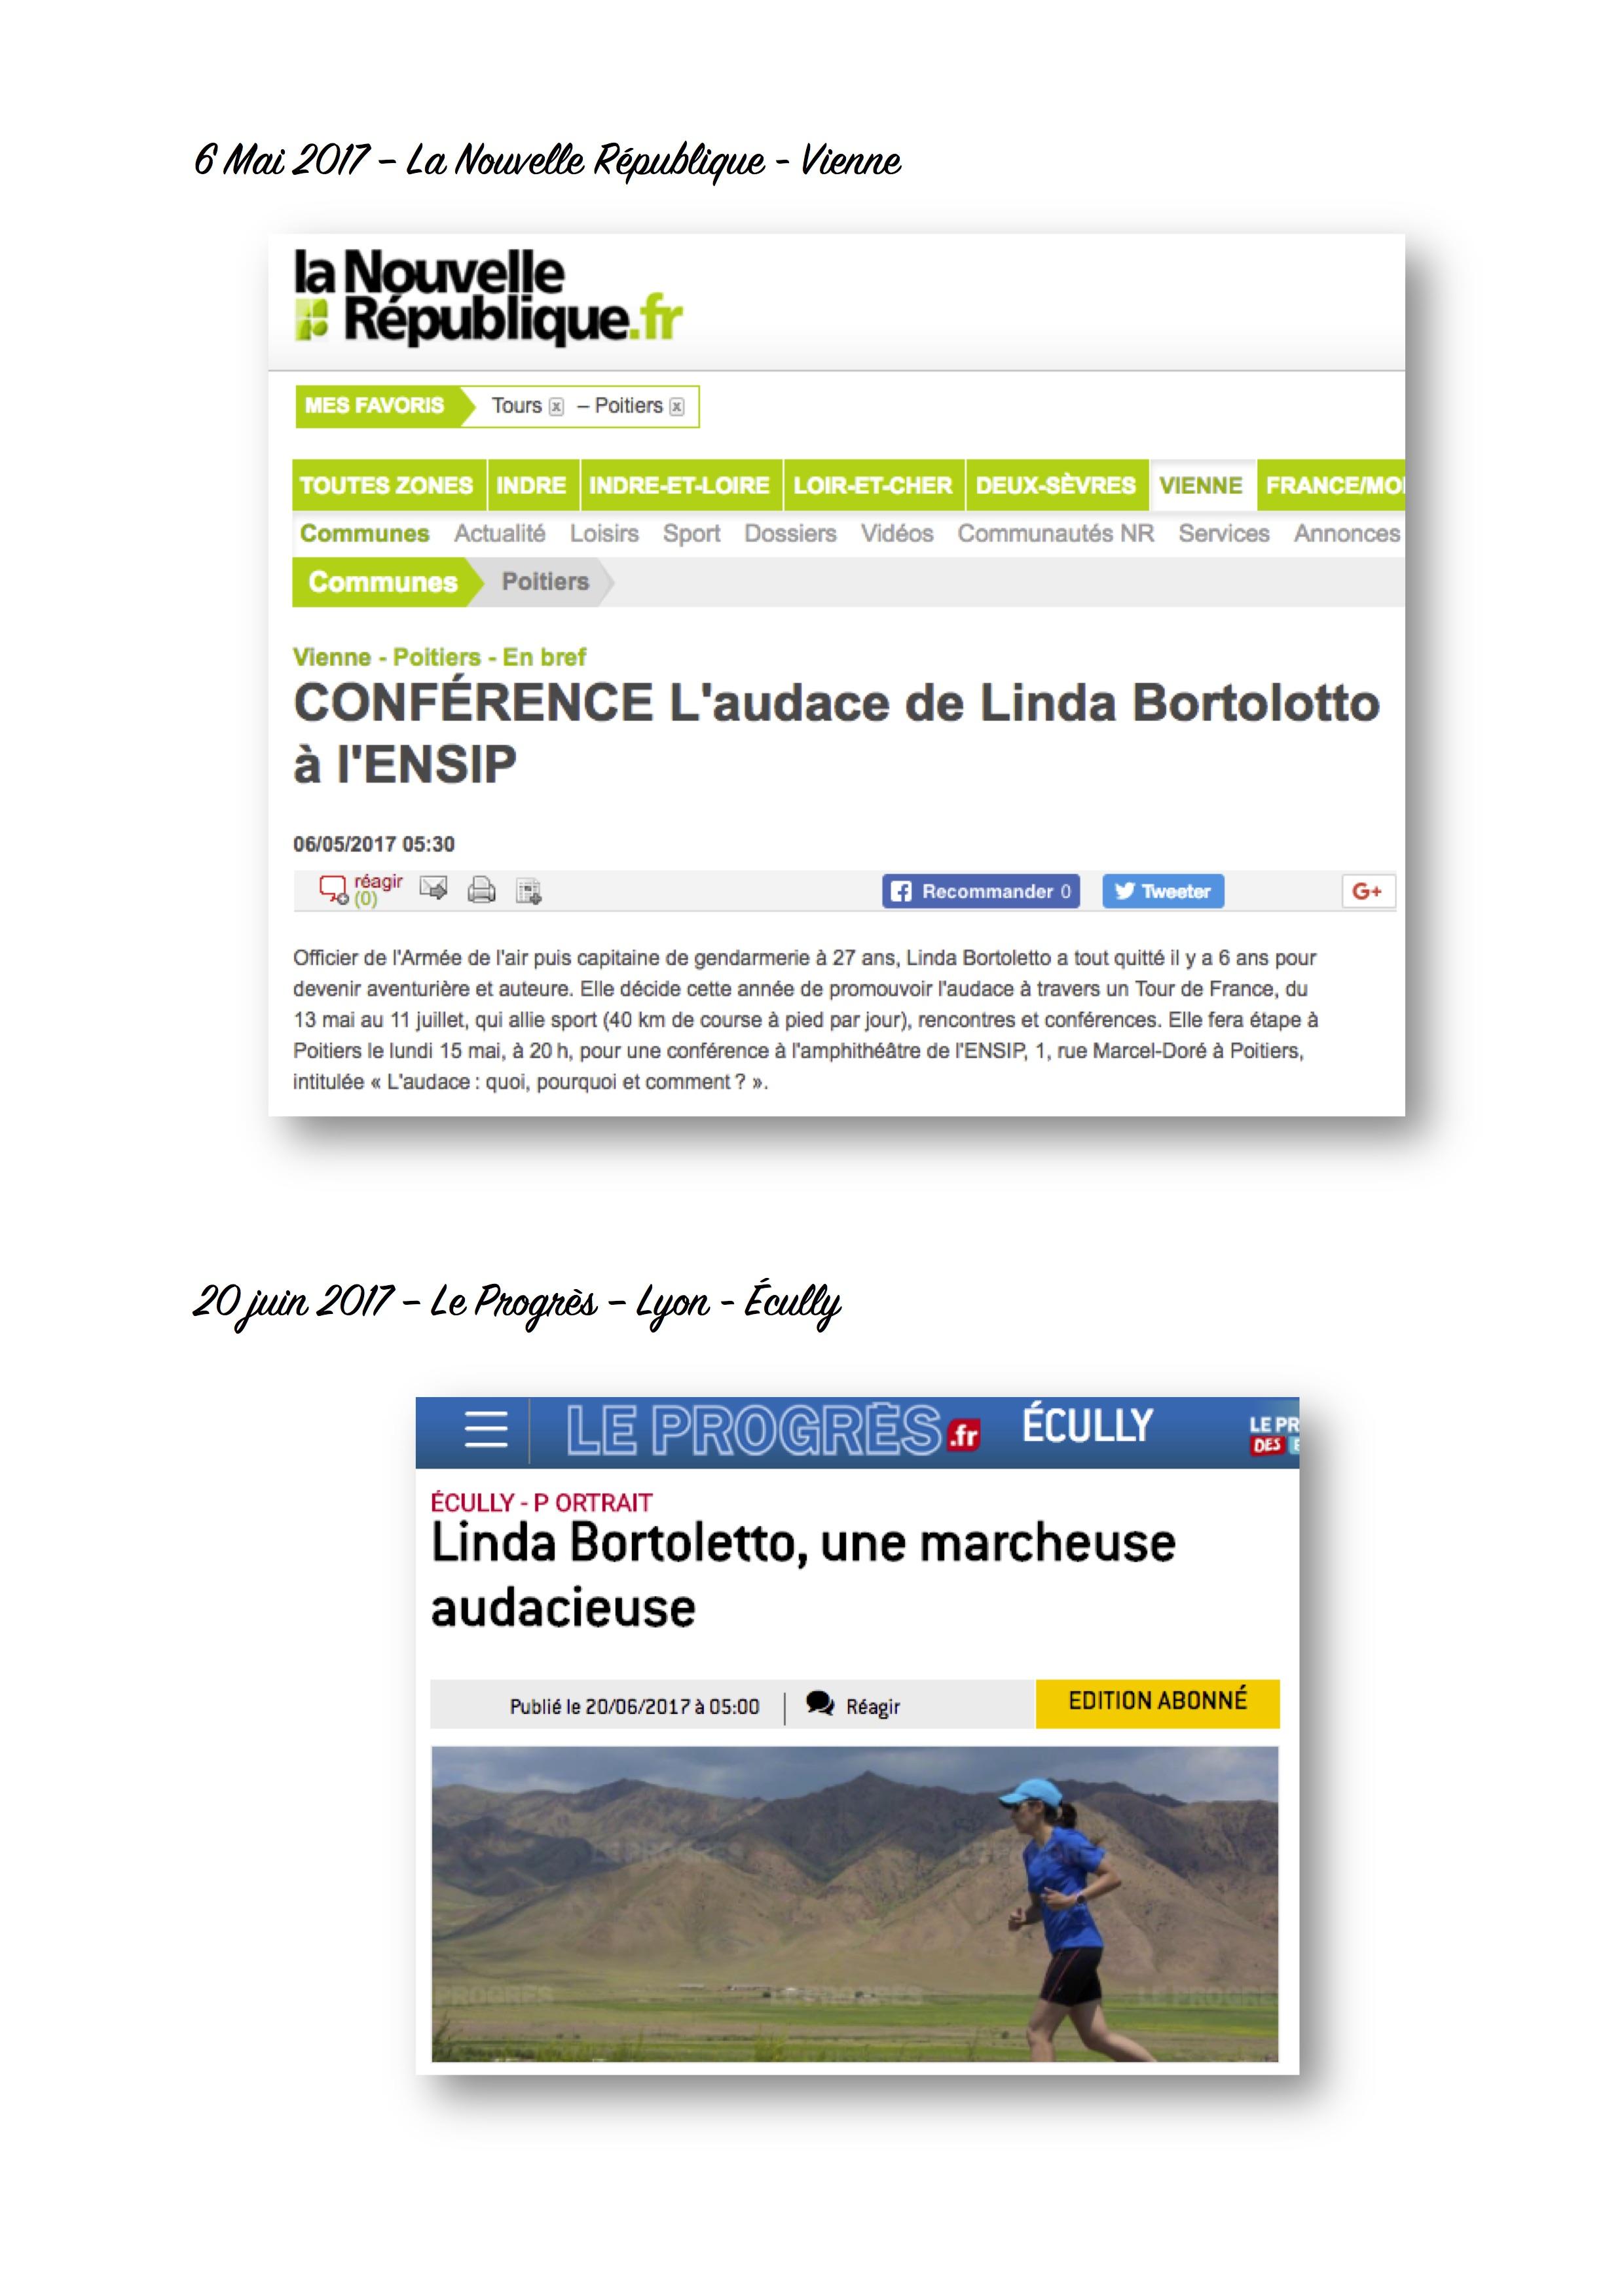 Revue de presse_TdF Audace_Web 5.jpg